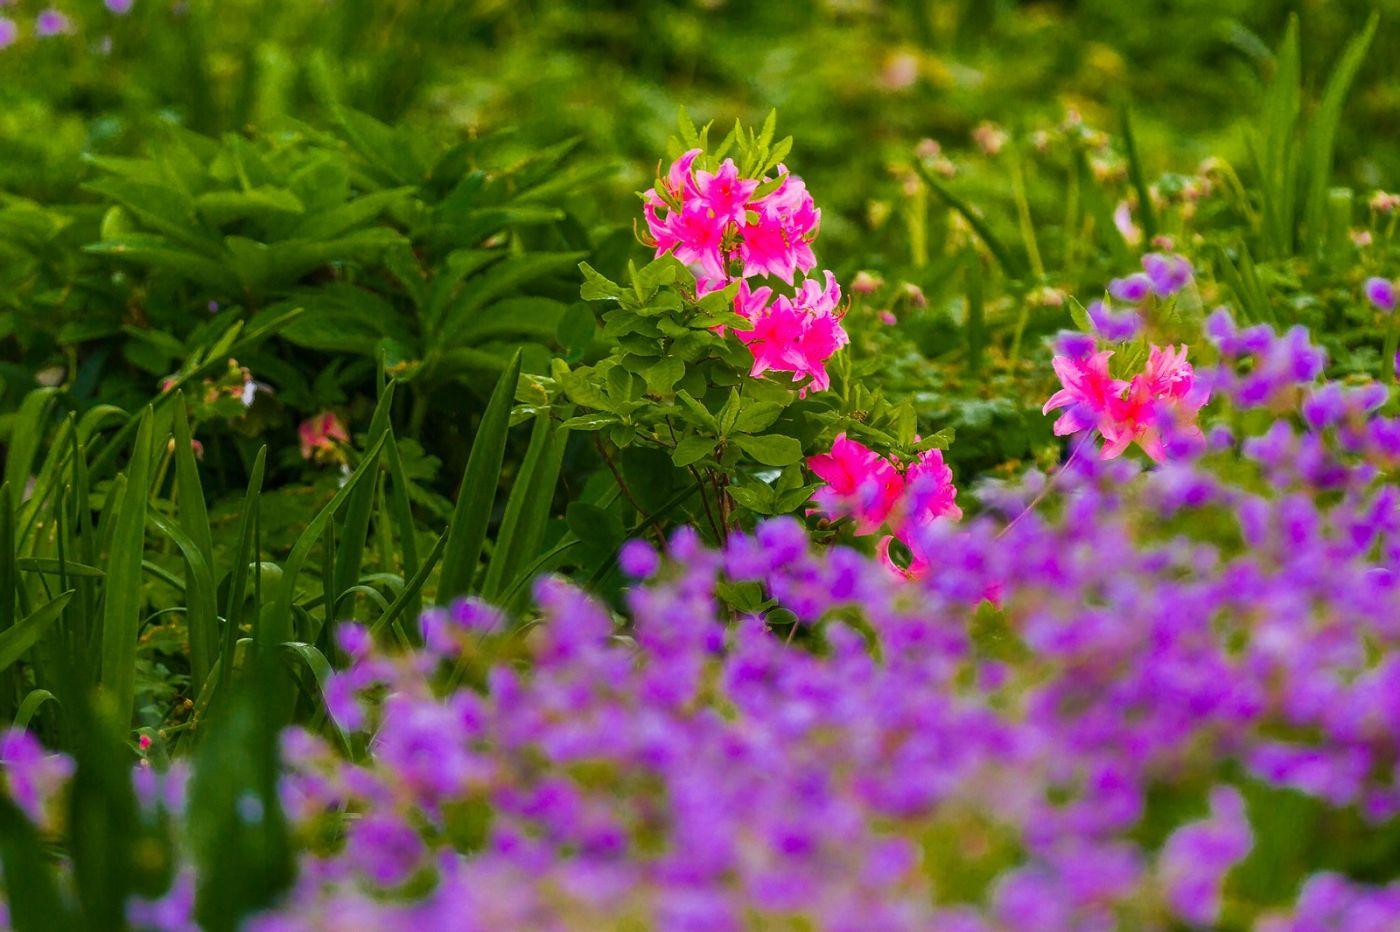 Chanticleer花园,有梦想的季节_图1-27